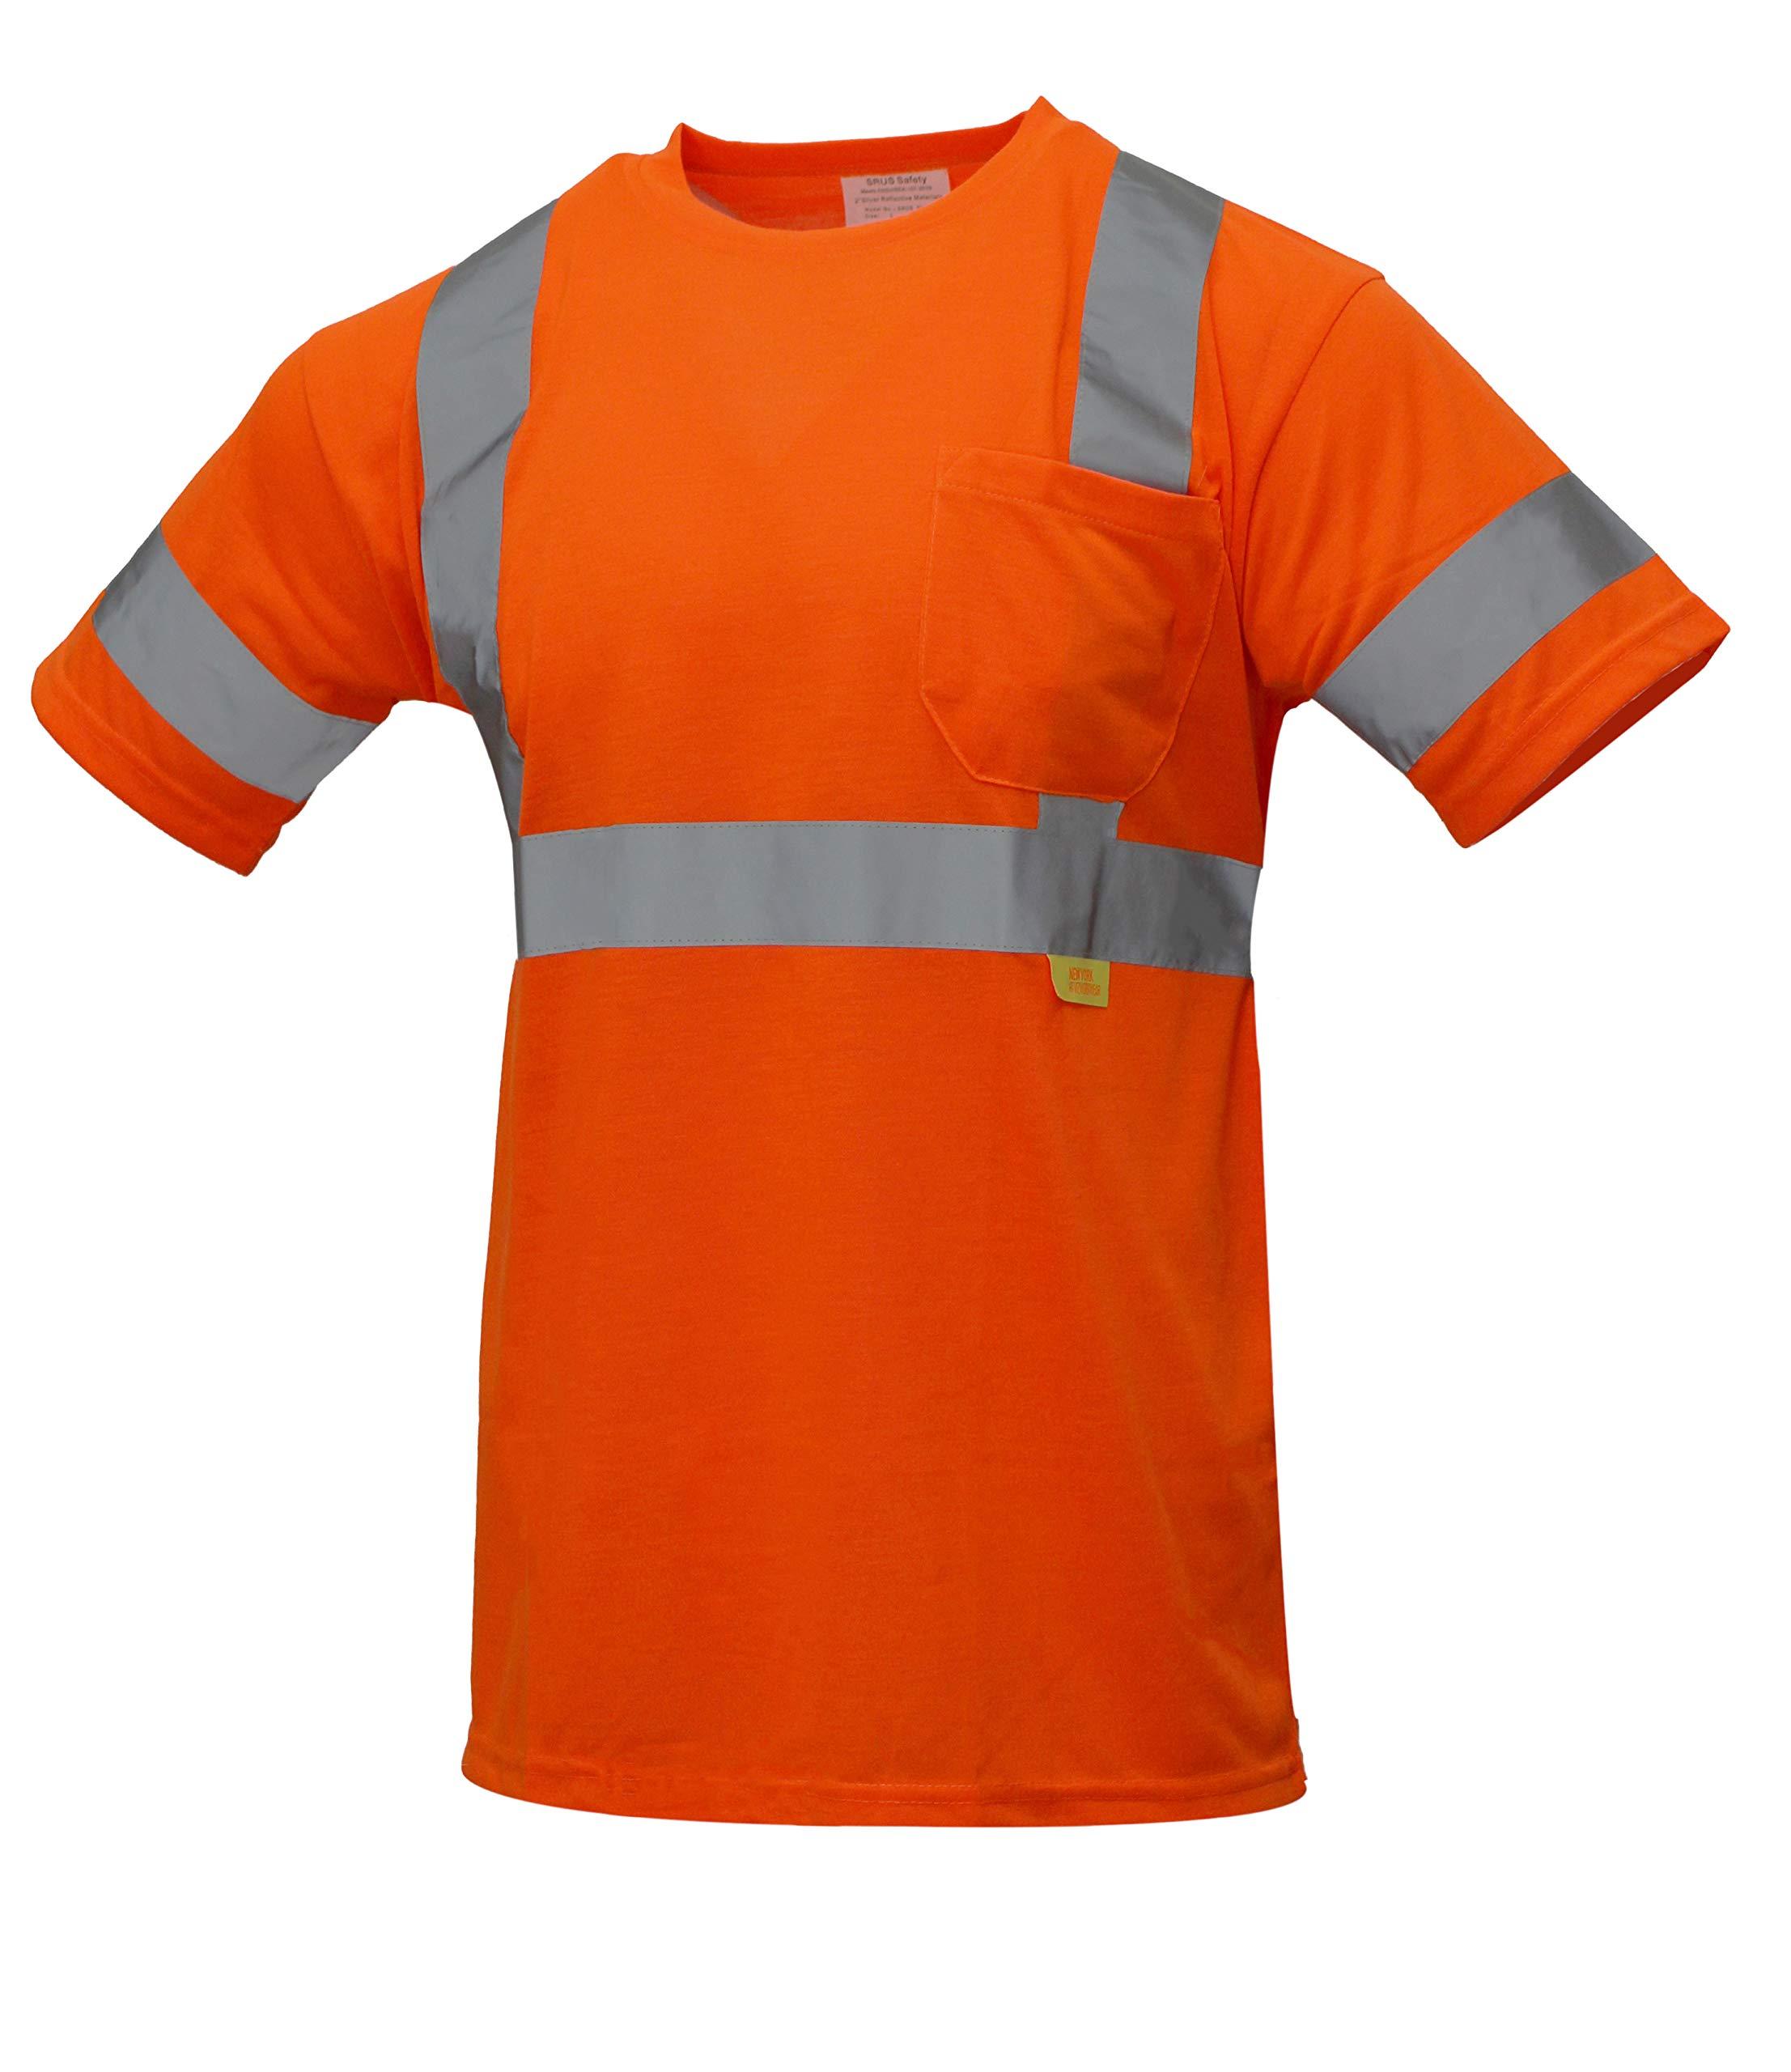 NY Hi-Viz Workwear Class 3 High Vis Reflective Short Sleeve ANSI Safety Shirt